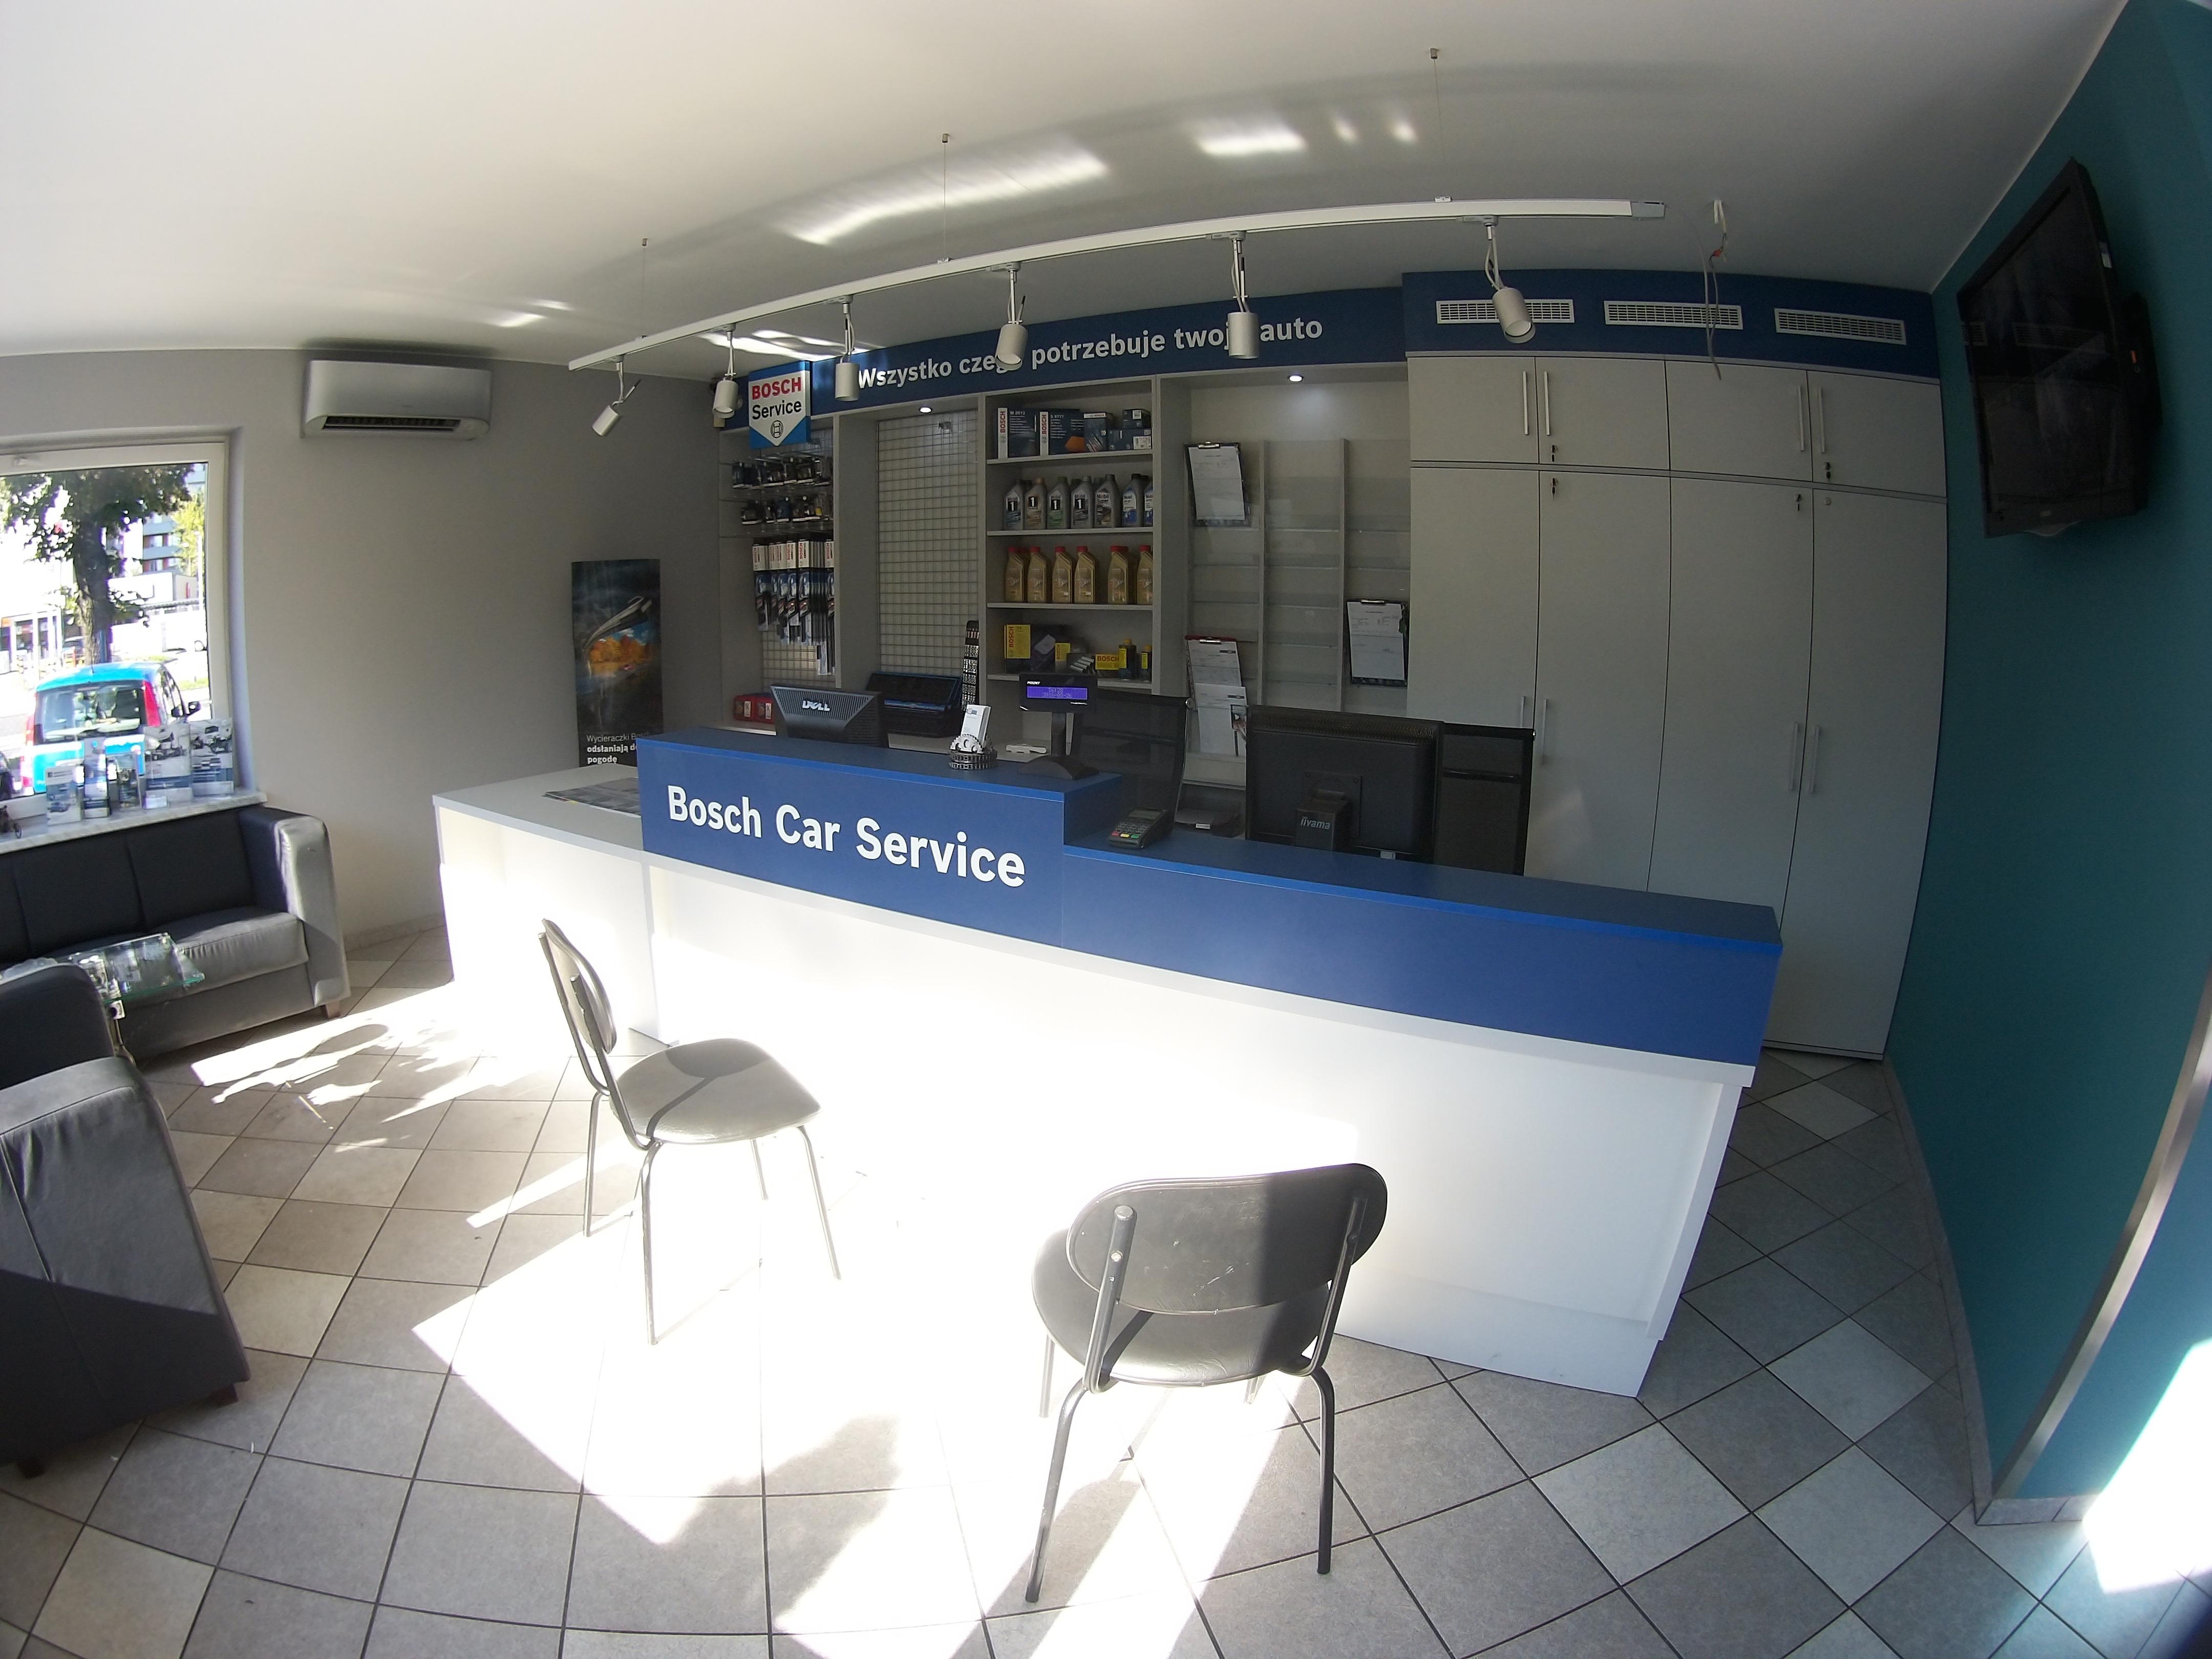 Bosch Kühlschrank Hotline : Bosch service auto koza racibórz